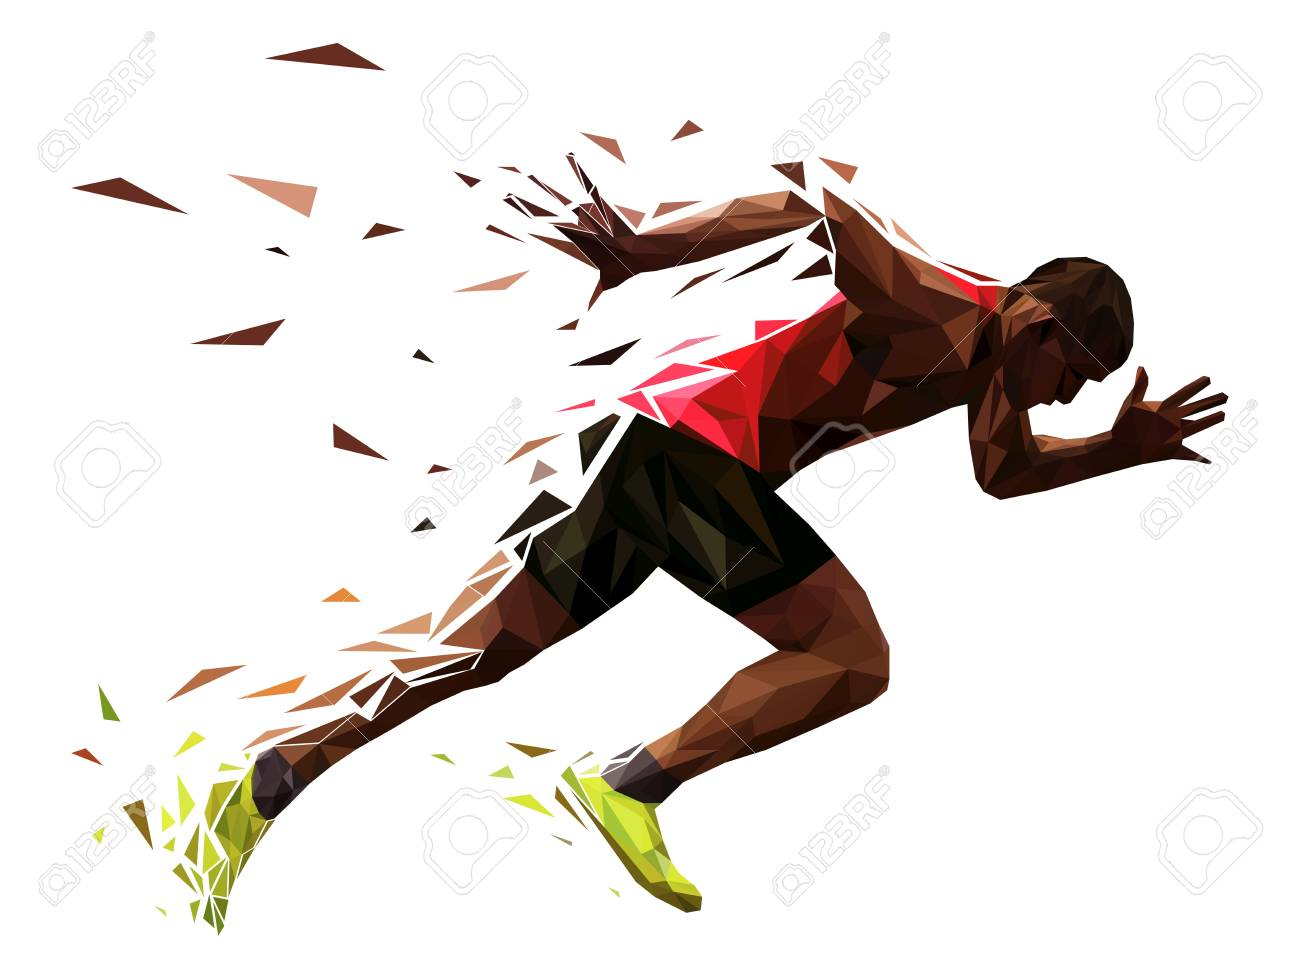 runner athlete sprint start explosive run vector illustration - 96063010